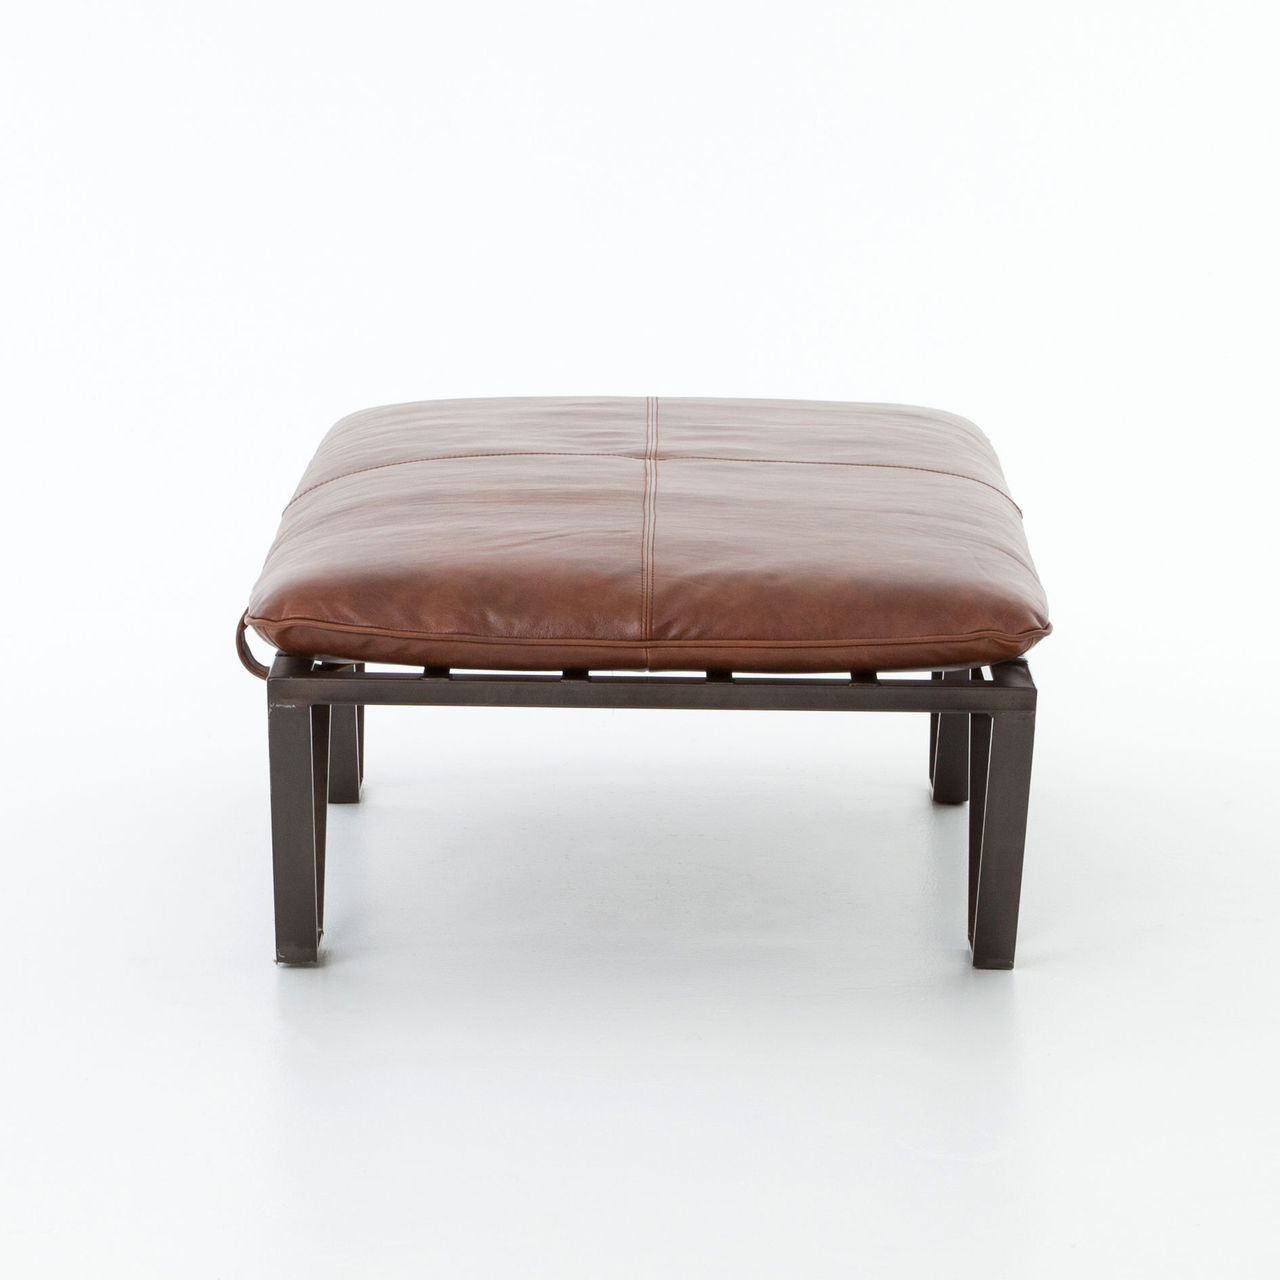 Darrow Tan Leather Ottoman With Geometric Metal Legs Zin